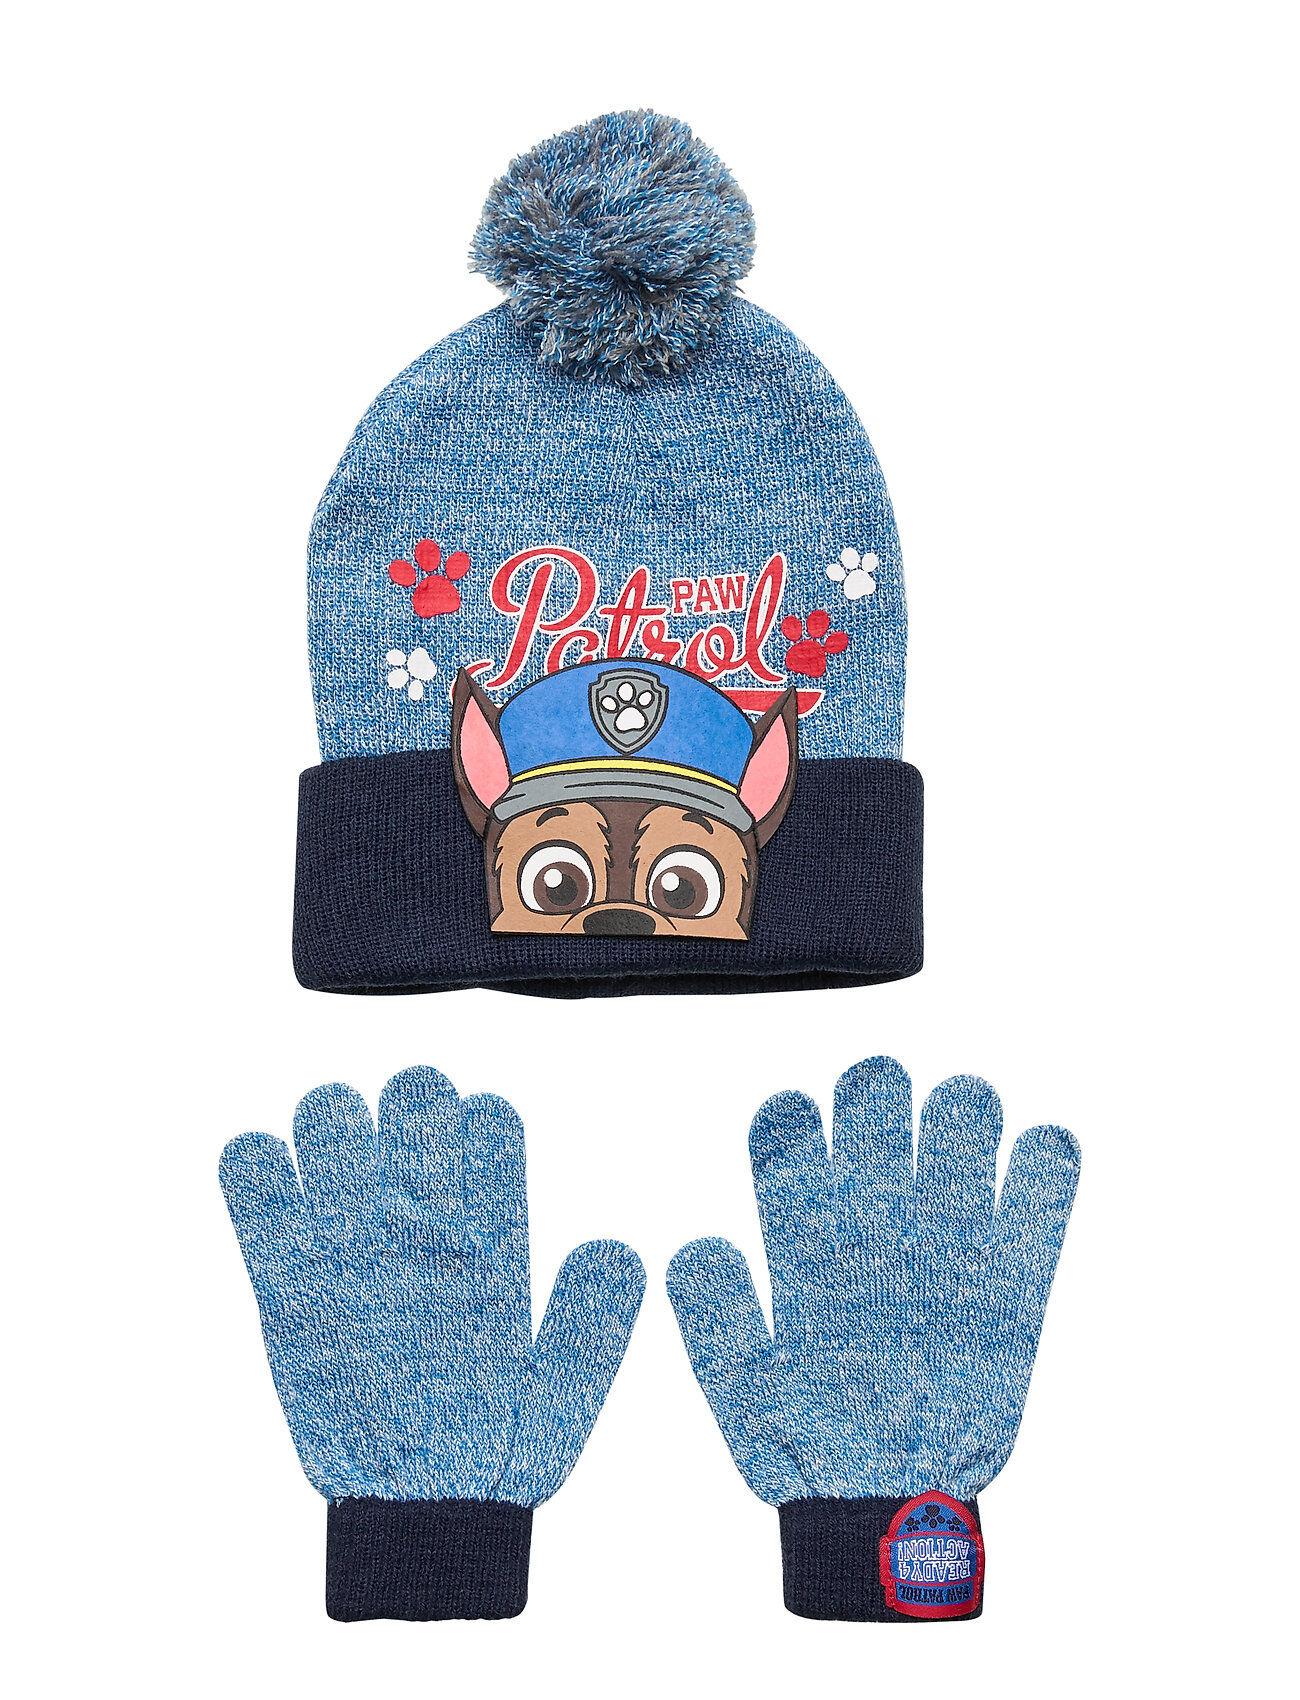 Paw Patrol Set 2 Pcs Hats & Gloves Accessories Headwear Hats Sininen Paw Patrol